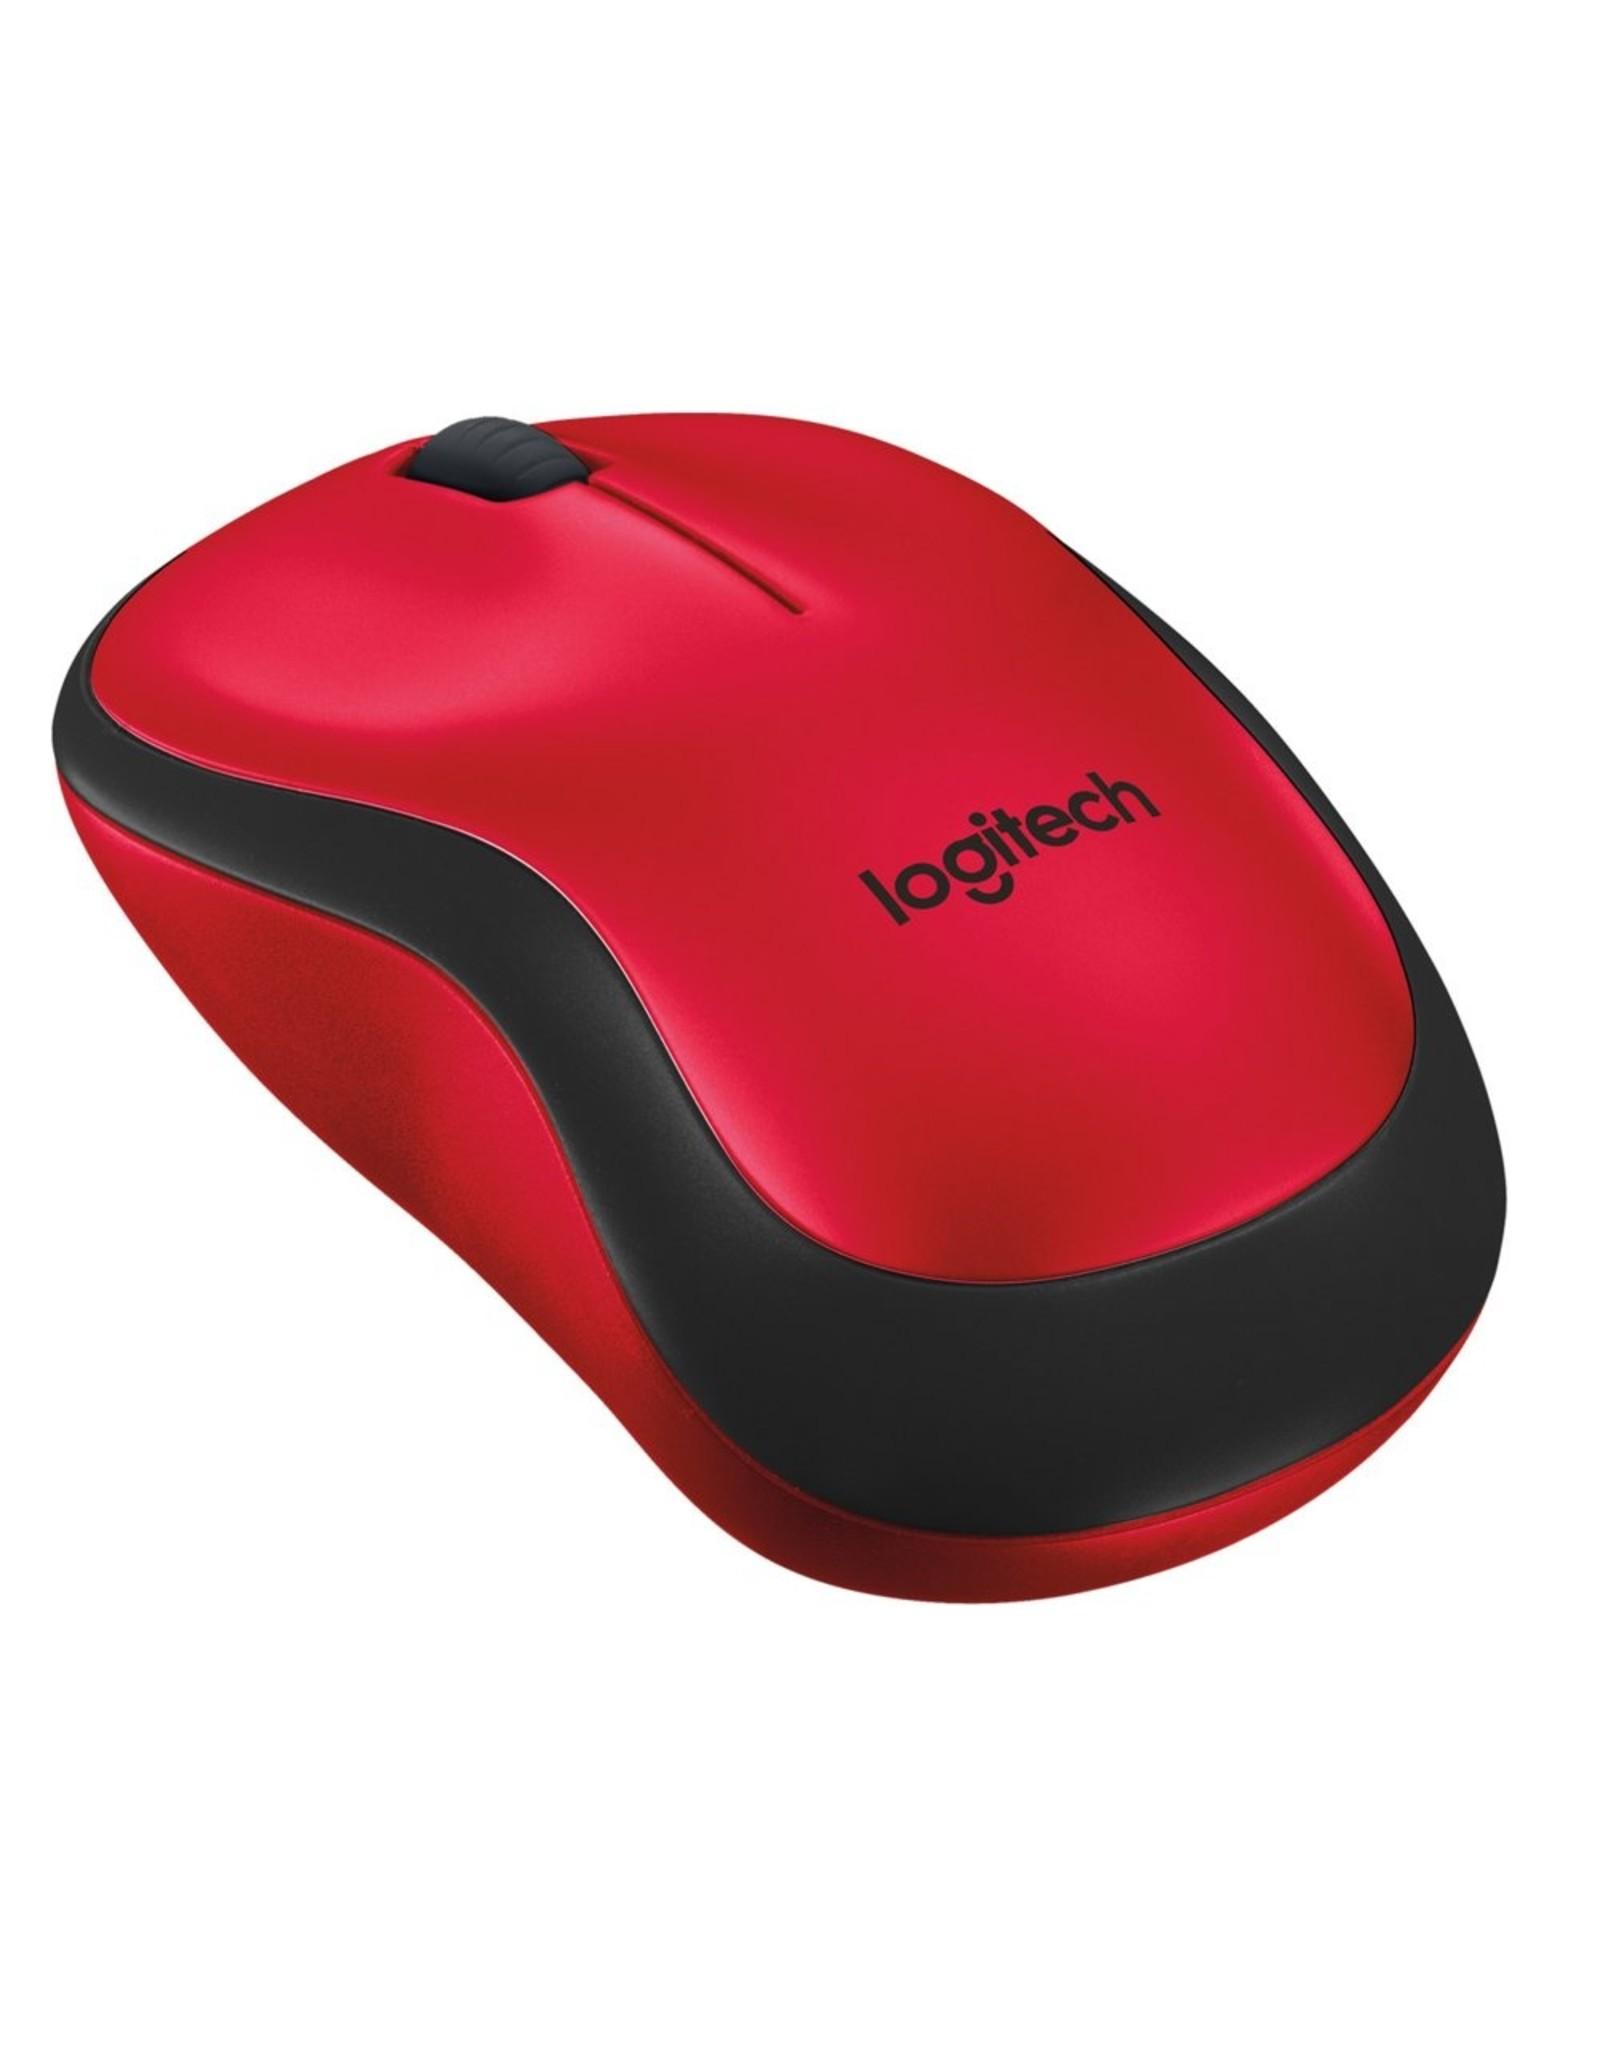 Logitech M220 Mouse Amb. RF Wireless Optical1000 DPI